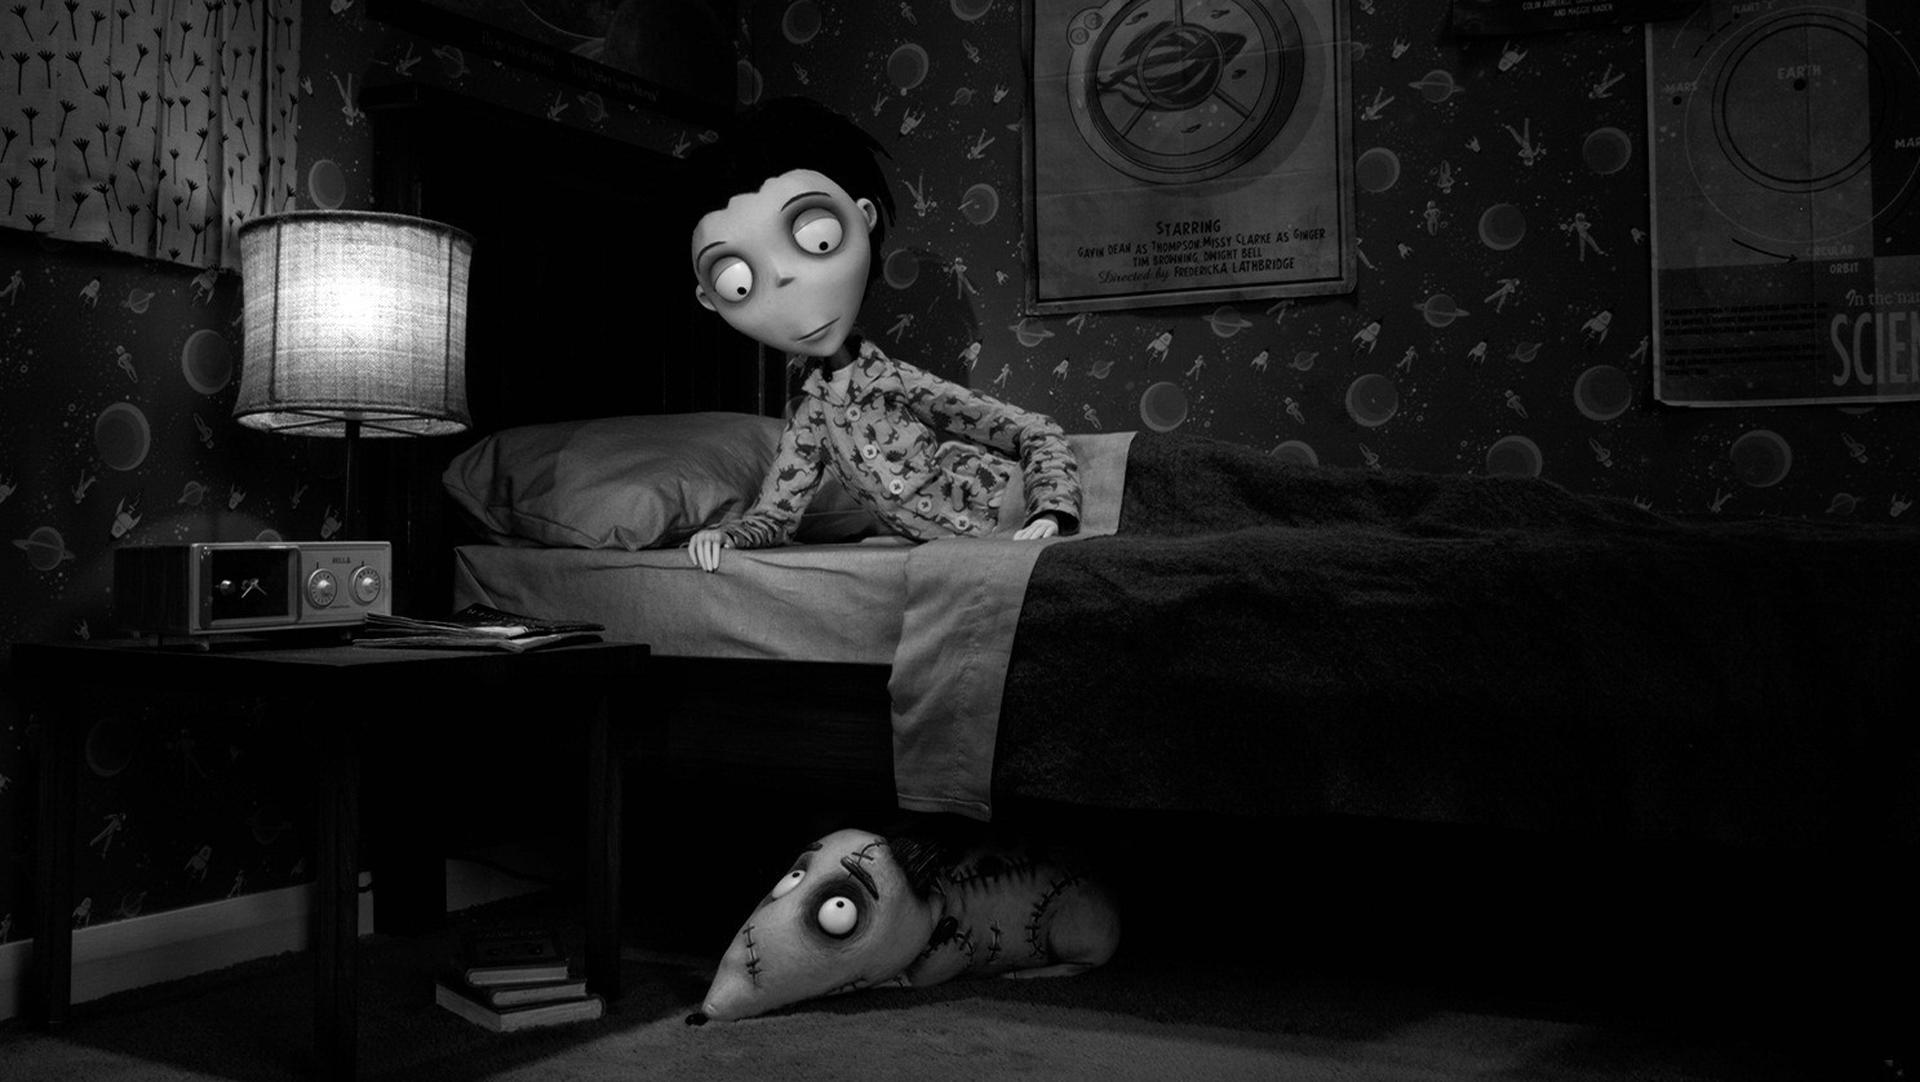 movies tim burton frankenweenie - photo #15